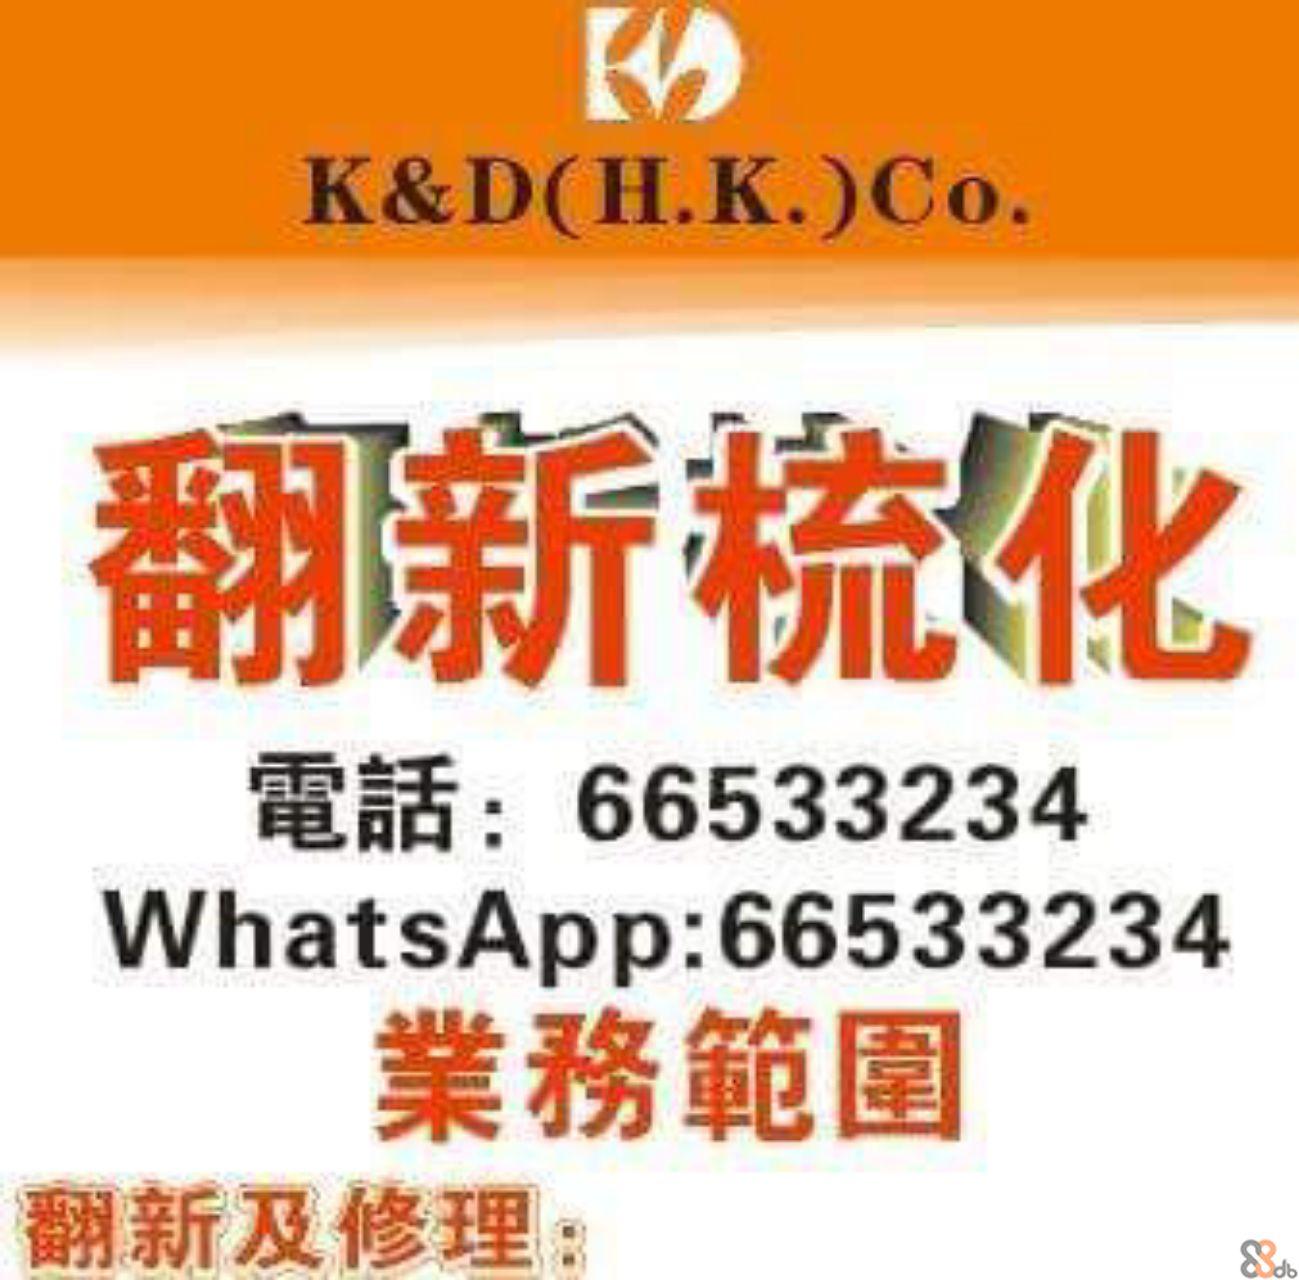 K&D(H.K.)Co. //楸化 電話: 66533234 WhatsApp: 66533234 業務範圍 翻新及修理:  Font,Text,Orange,Product,Line